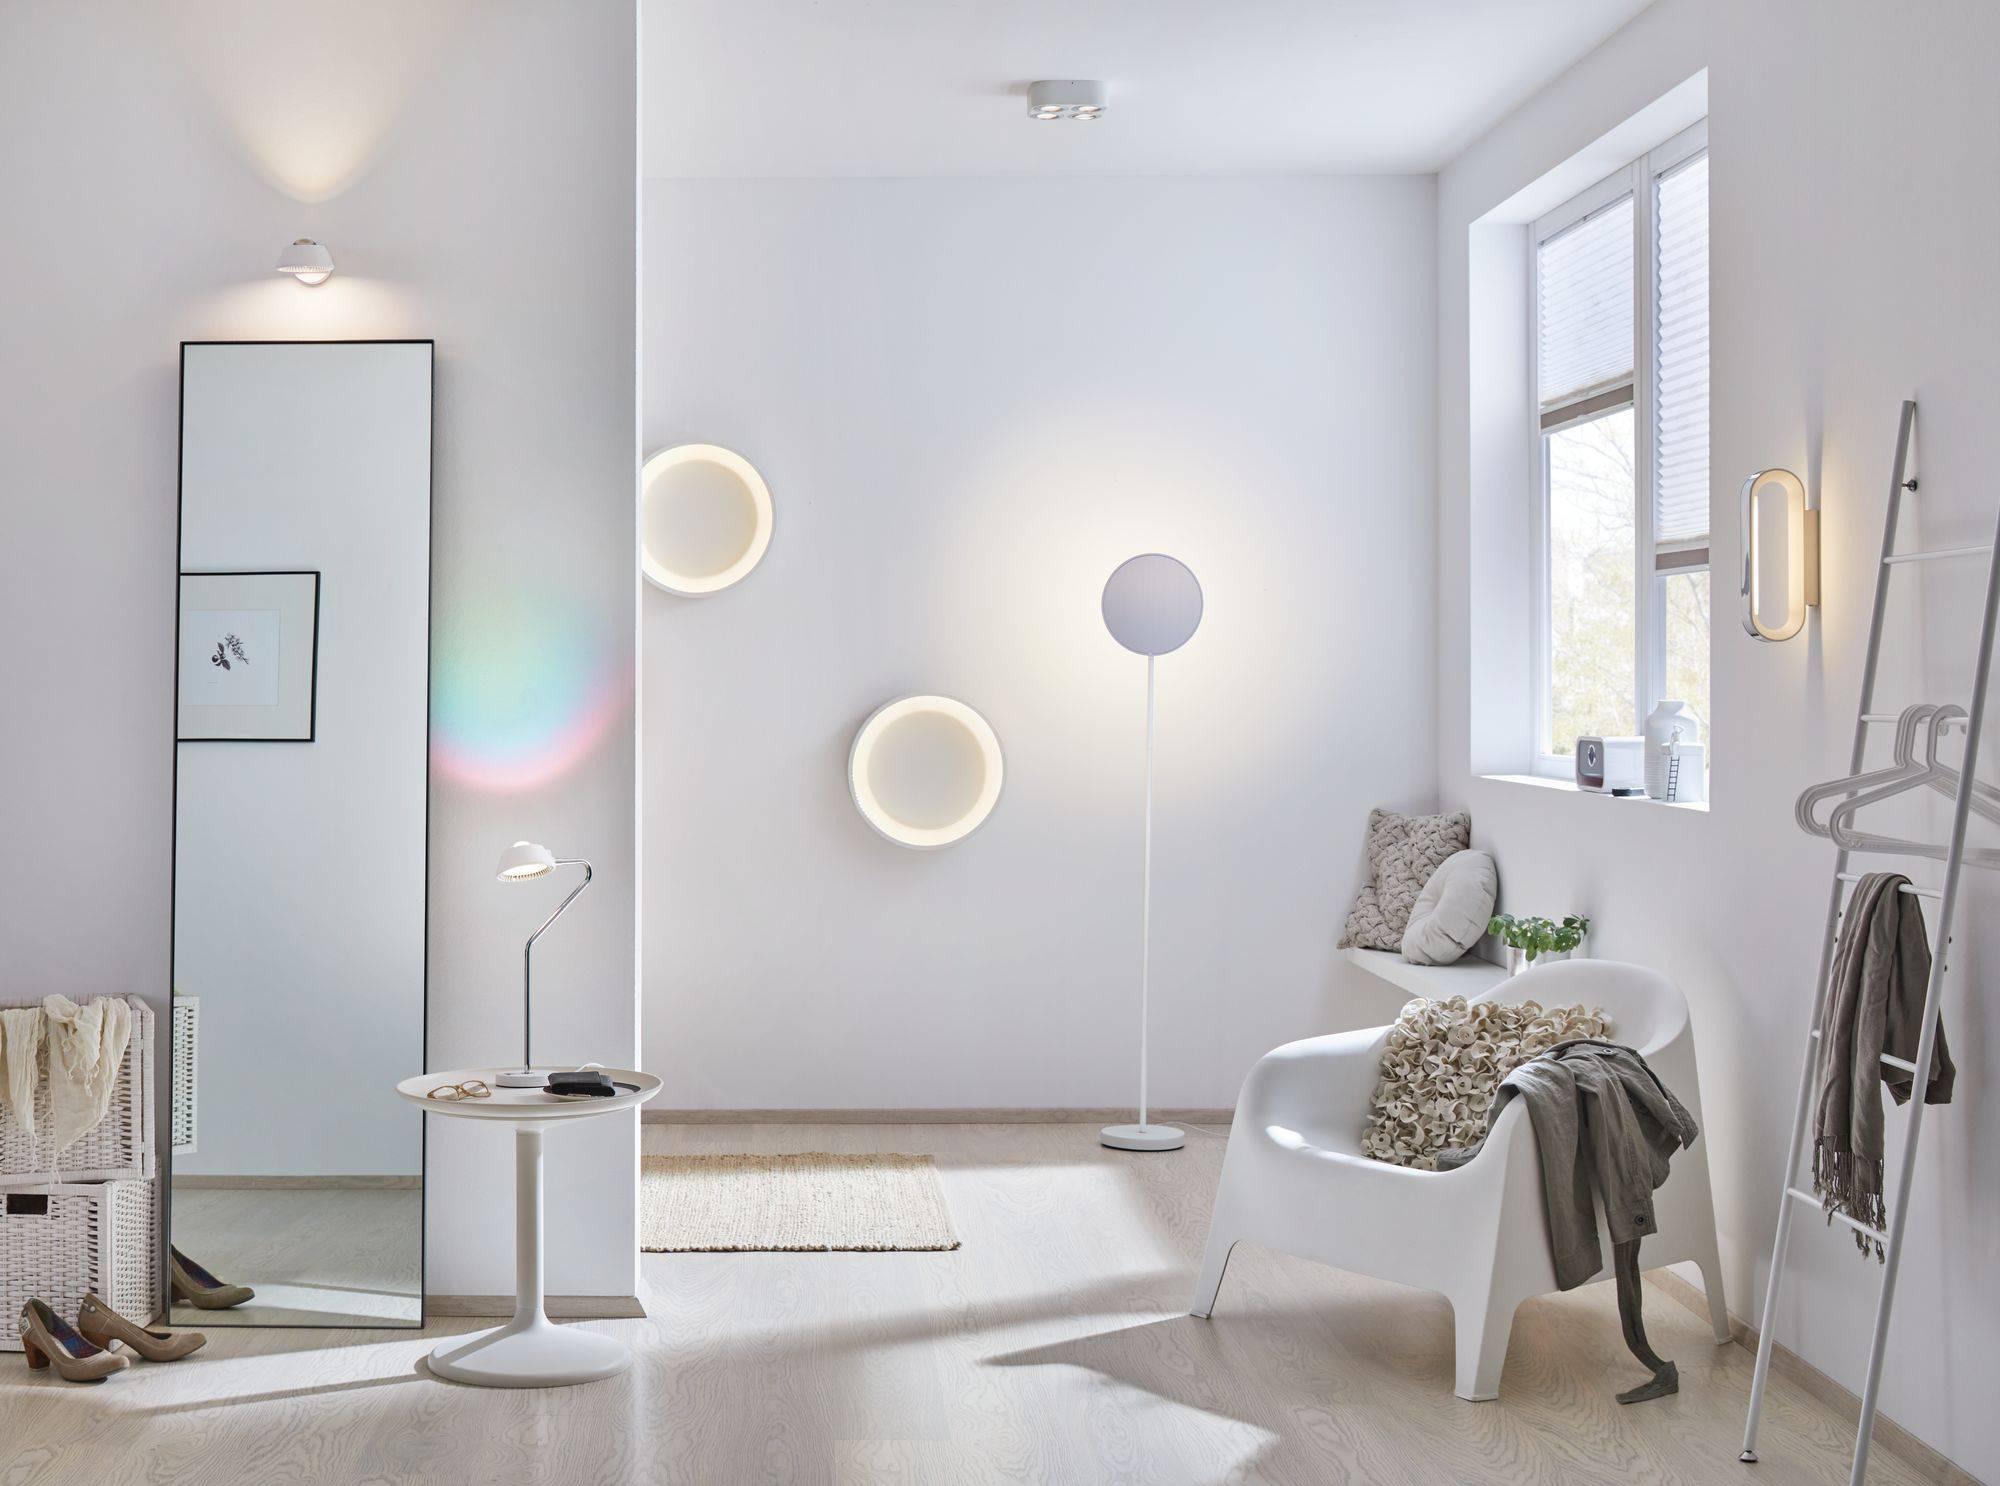 Badkamer Design Wandlamp : Led badkamer wandlamp w warm wit paulmann agena chroom